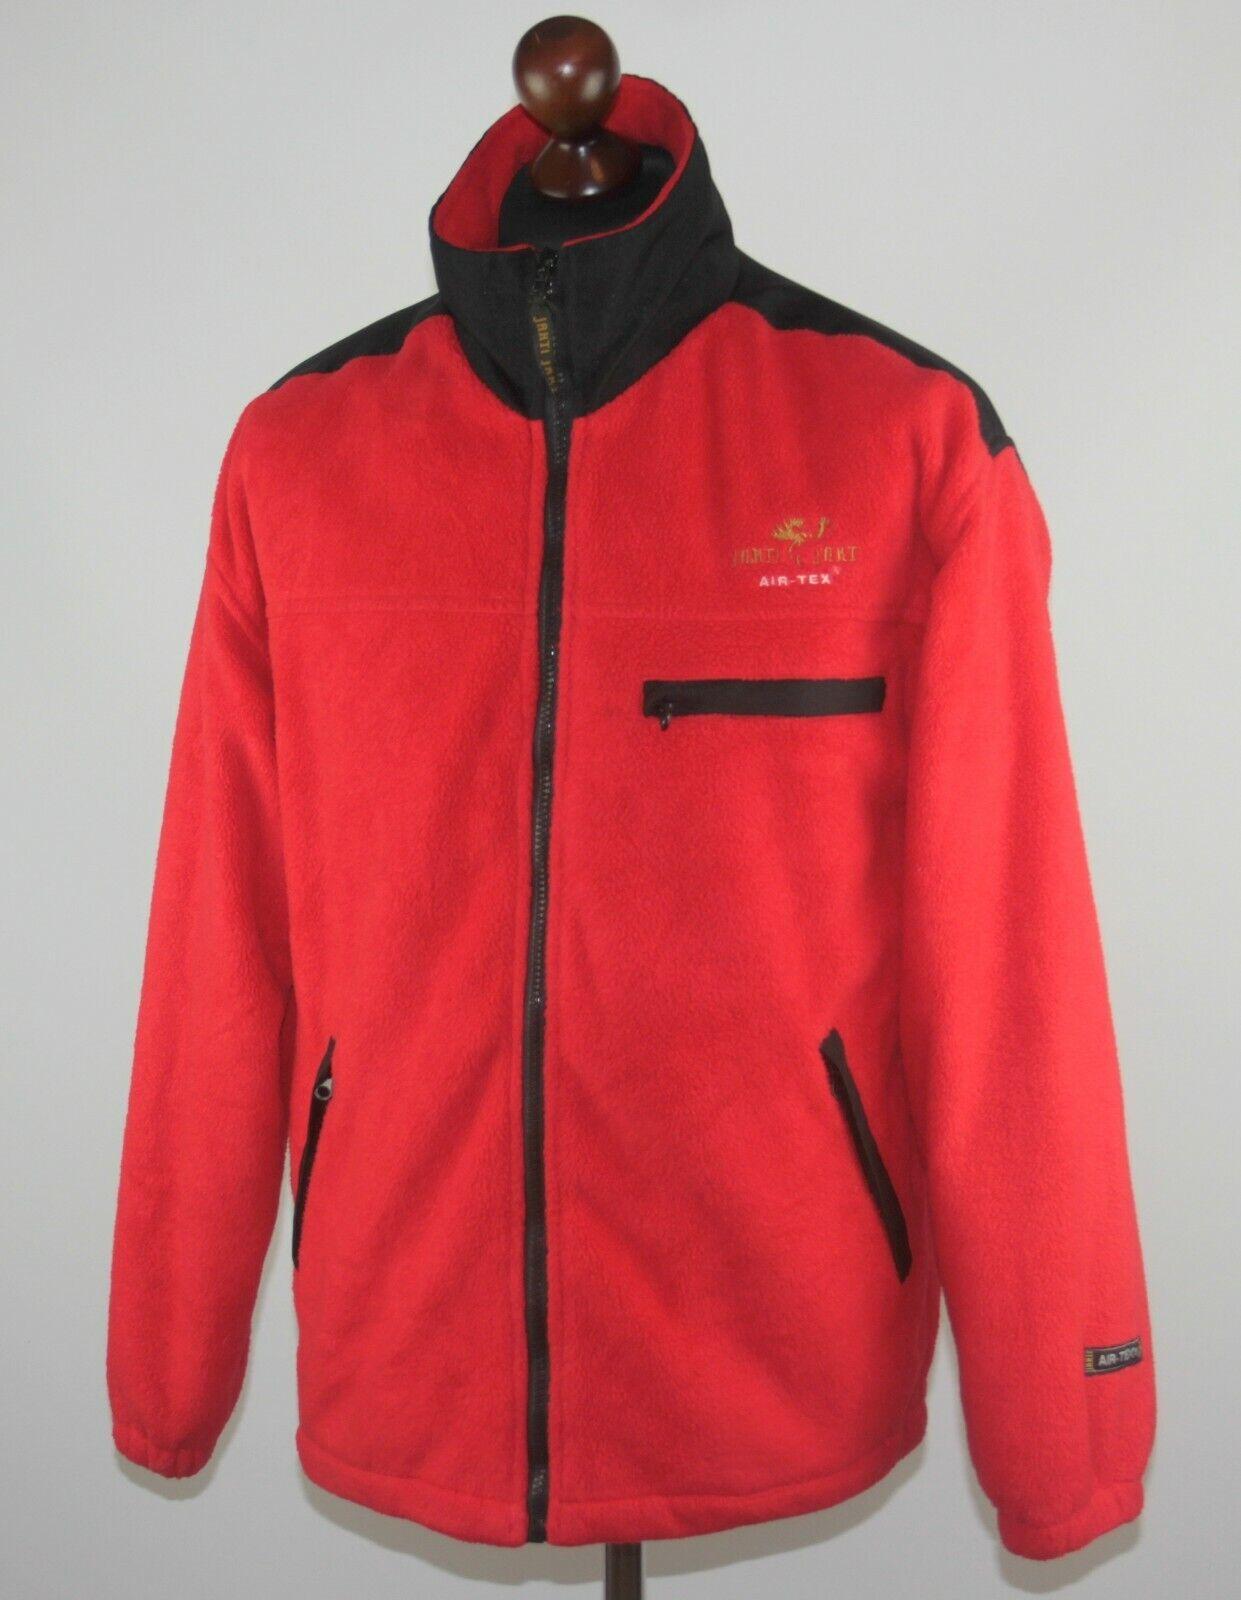 Jahti Jakt Finland hunting mens rot fleece jumper jacket Größe S Air-Tex